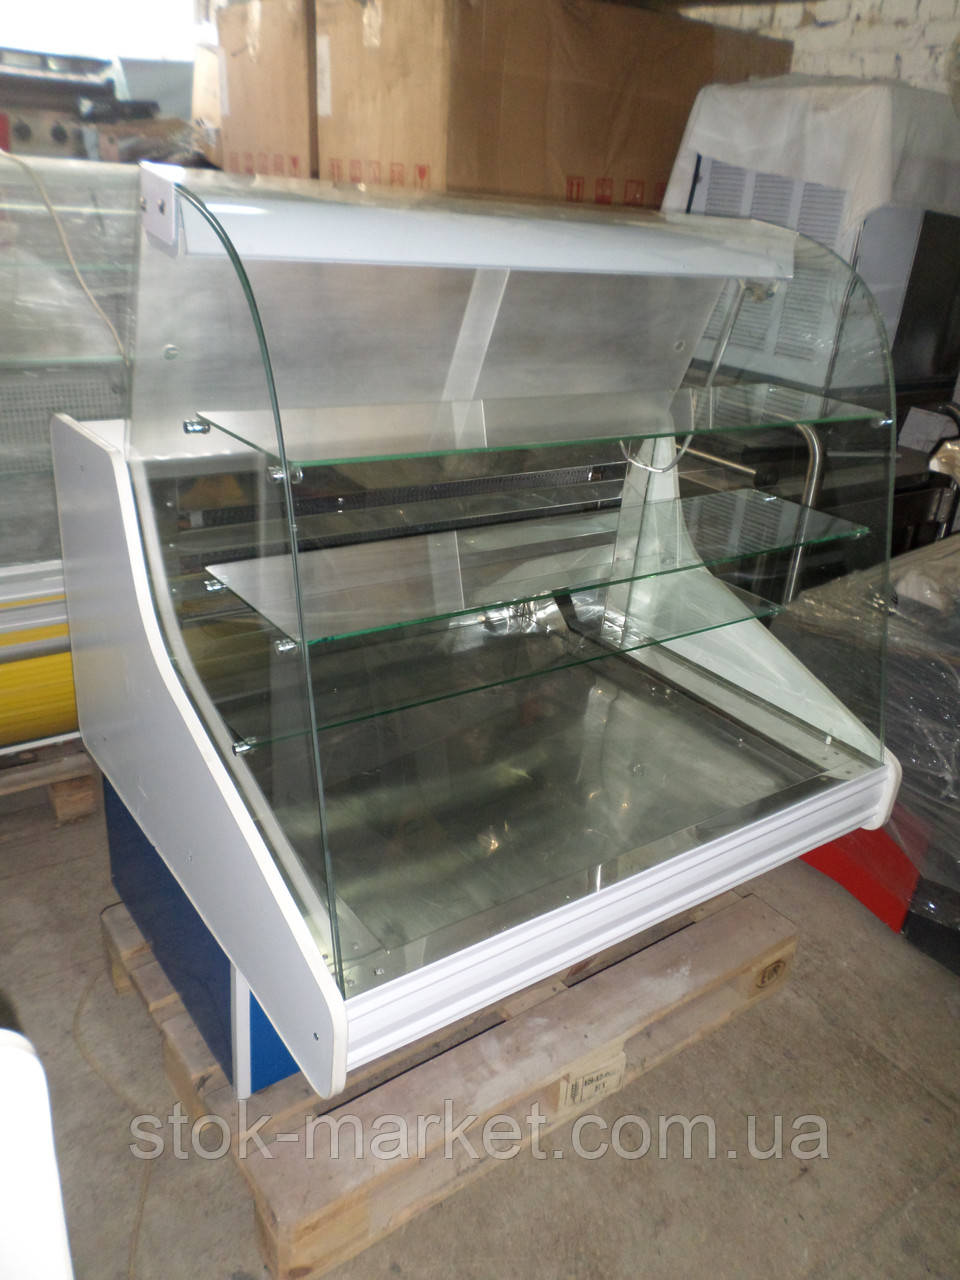 Кондитерские холодильные витрины, кондитерская витрина Технохолод Флорида 1,1 м.